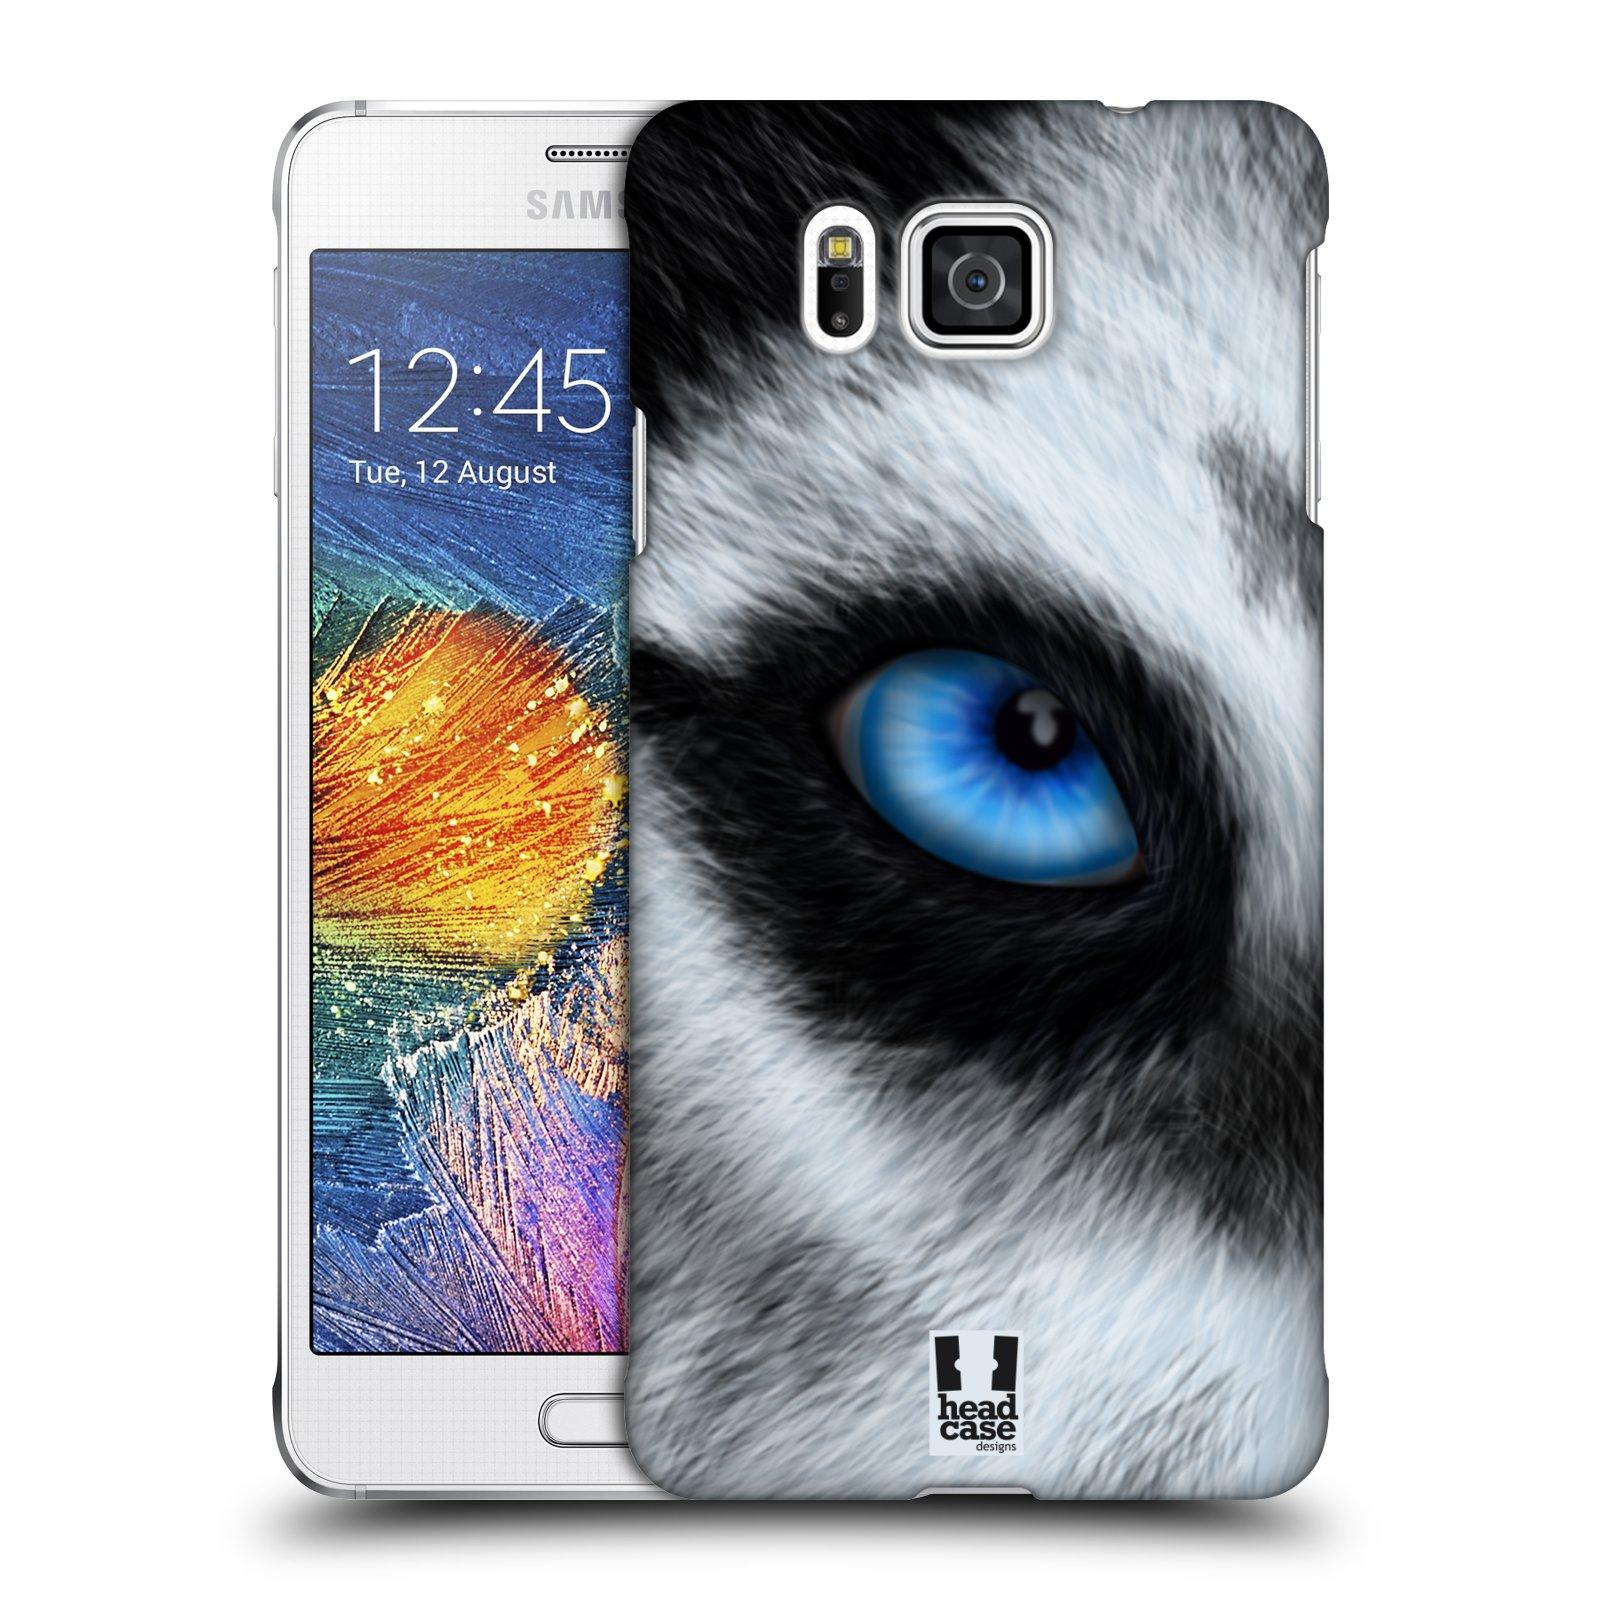 HEAD CASE plastový obal na mobil SAMSUNG Galaxy Alpha (G850) vzor pohled zvířete oko pes husky